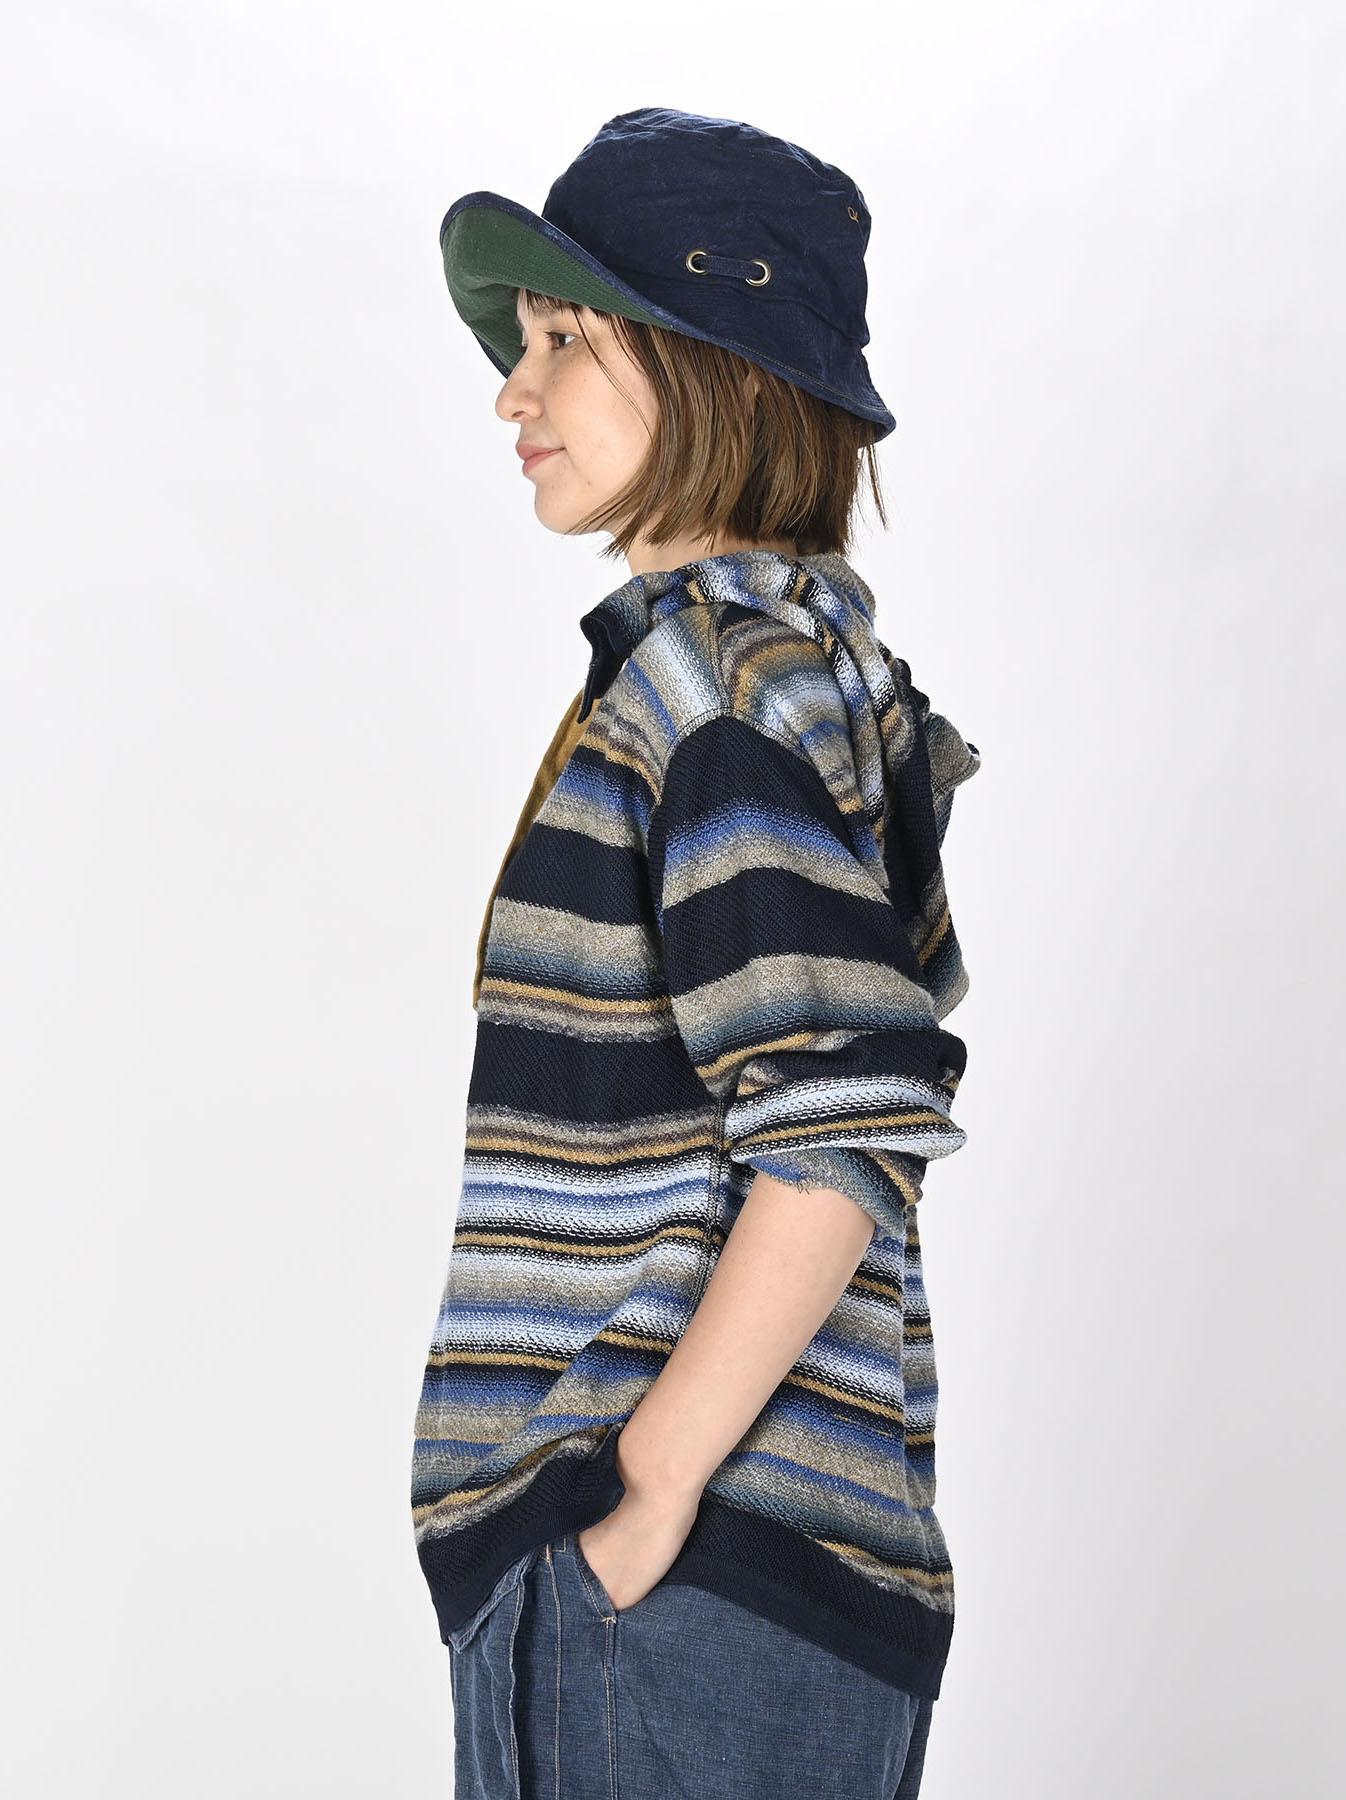 Indigo Rainbow Stripe Knit-sew 908 Umahiko Hoodie (0721)-7